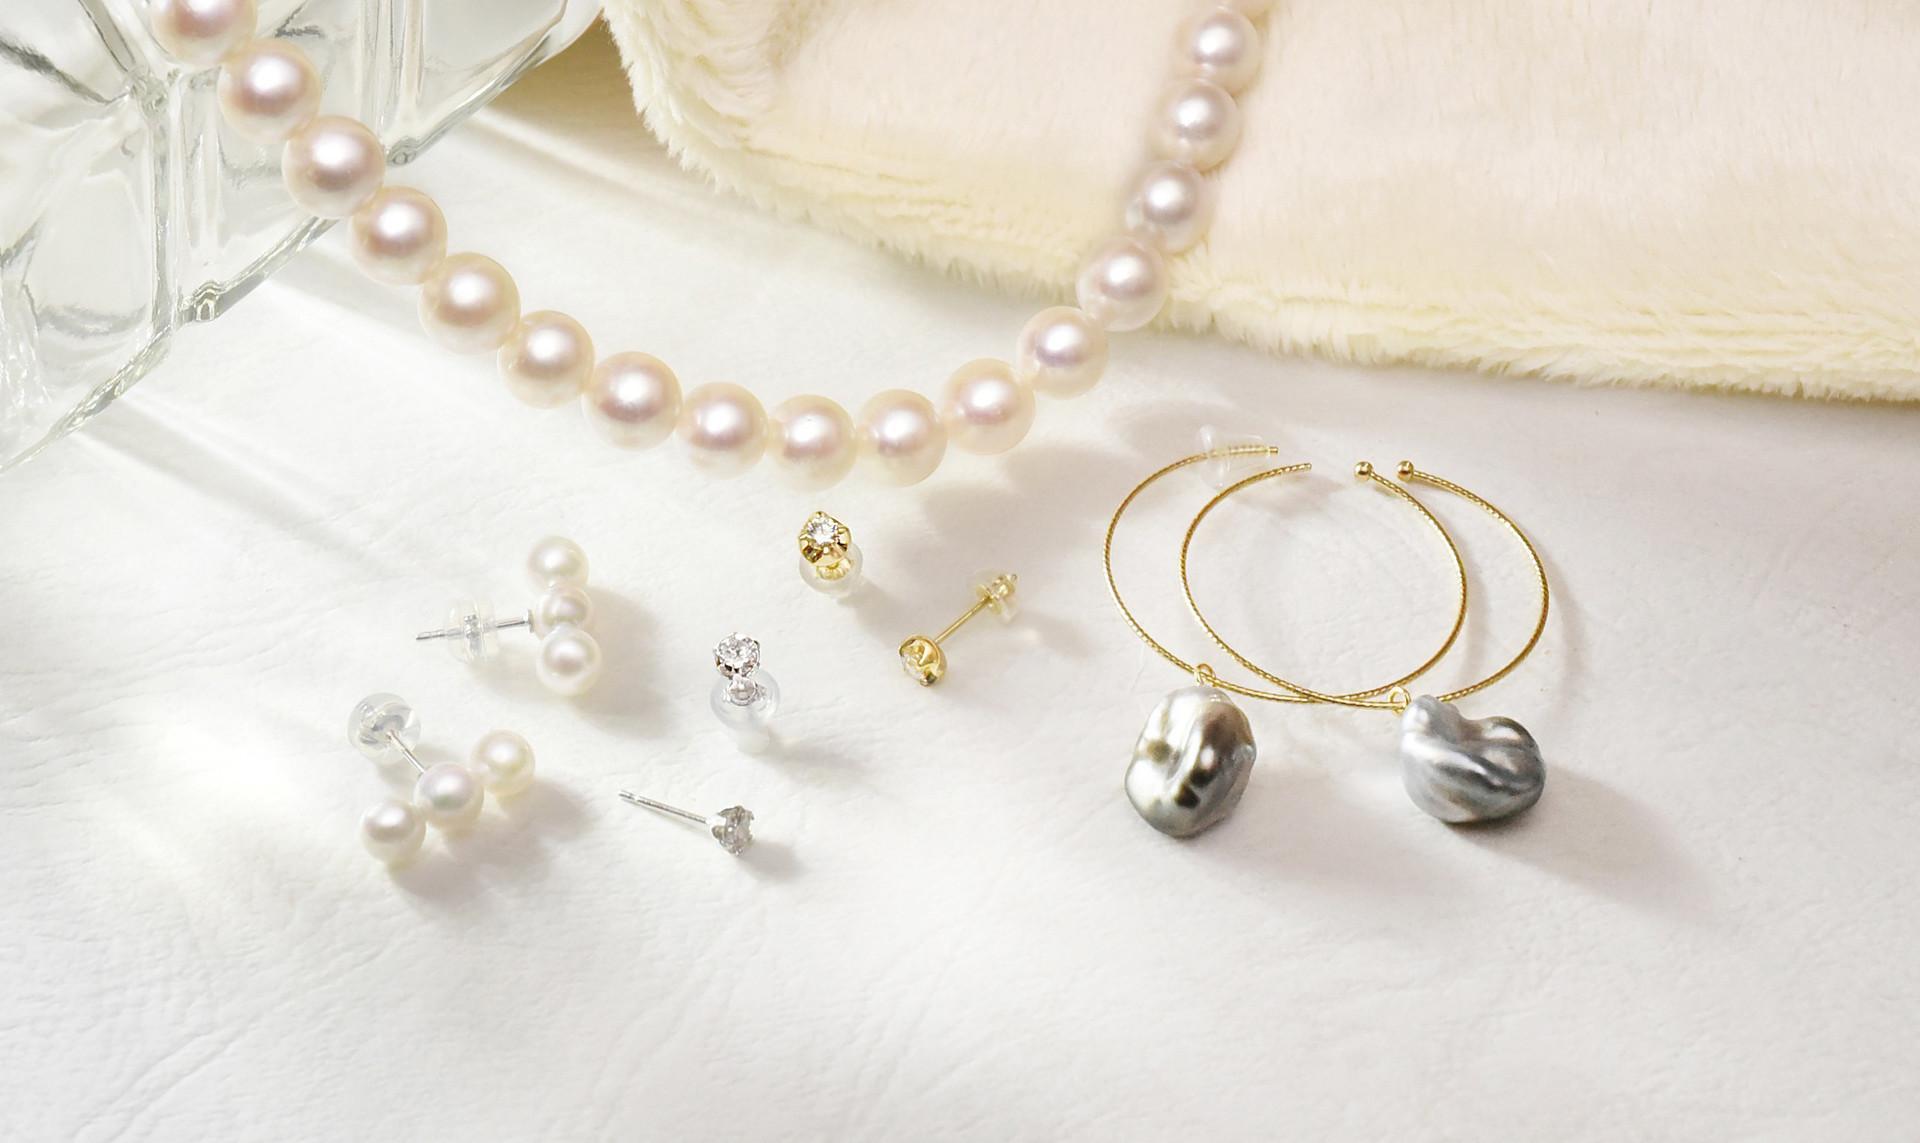 Variety Jewelry